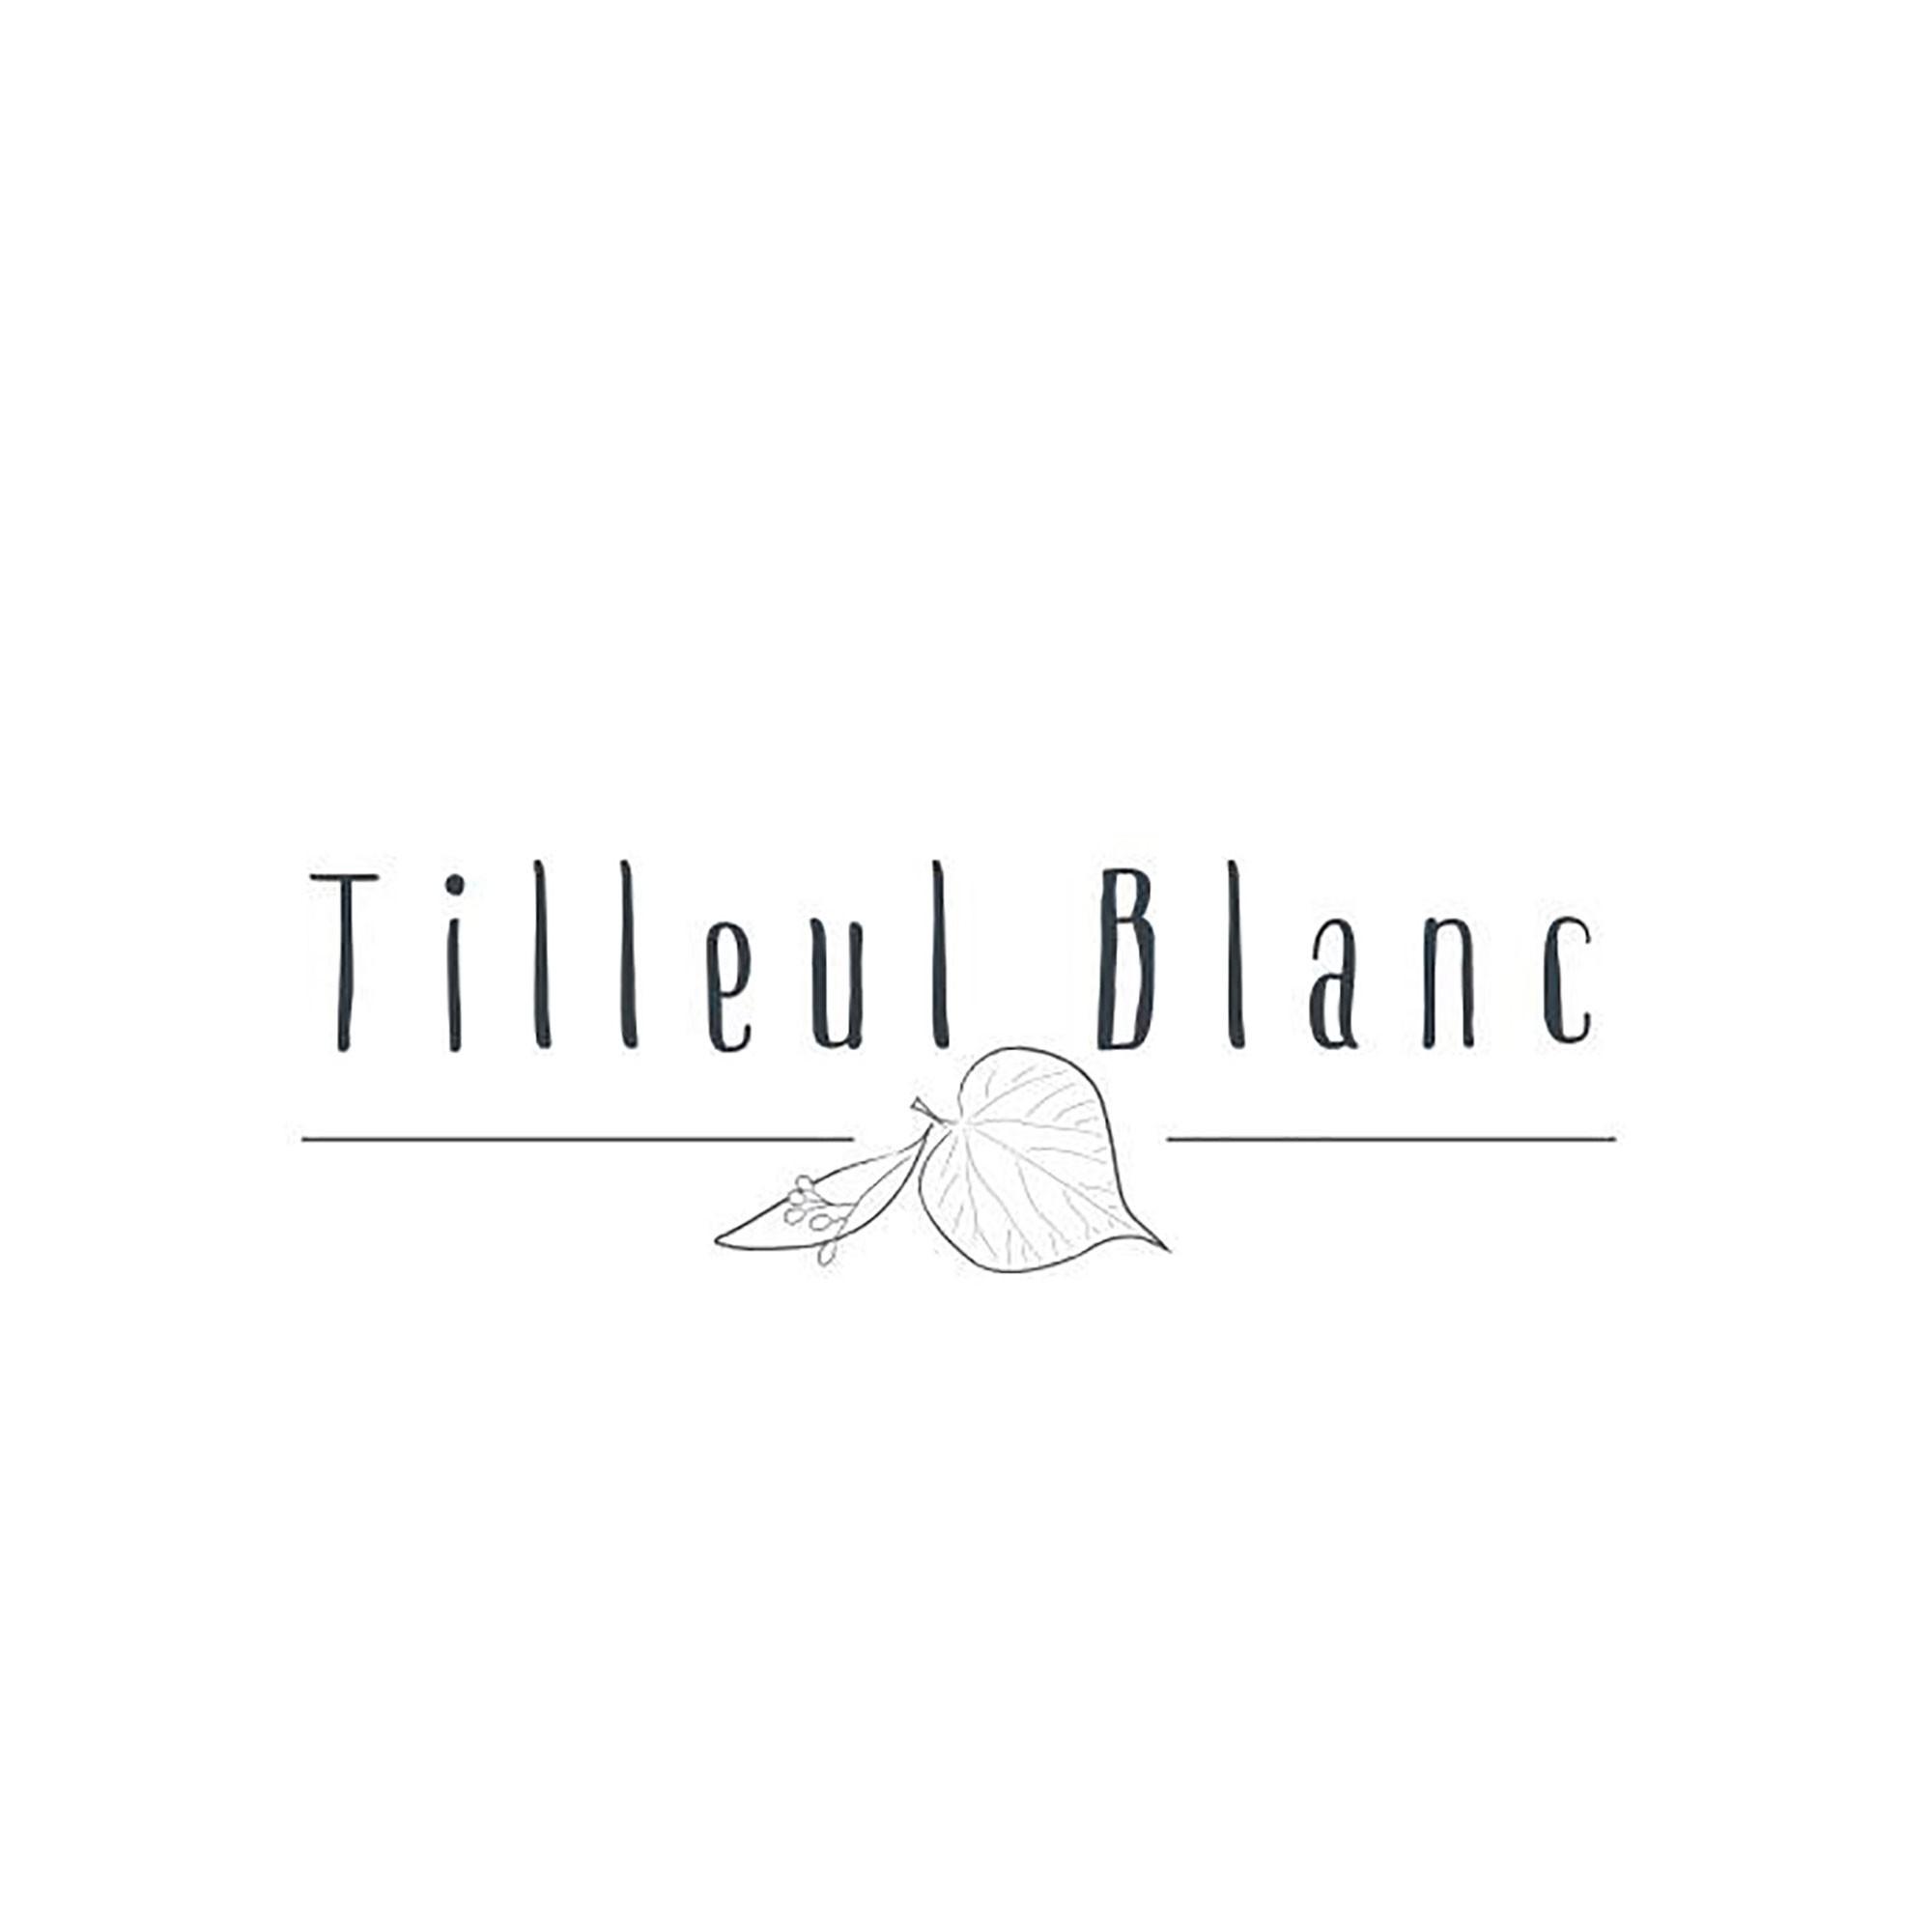 TILLEUL BLANC